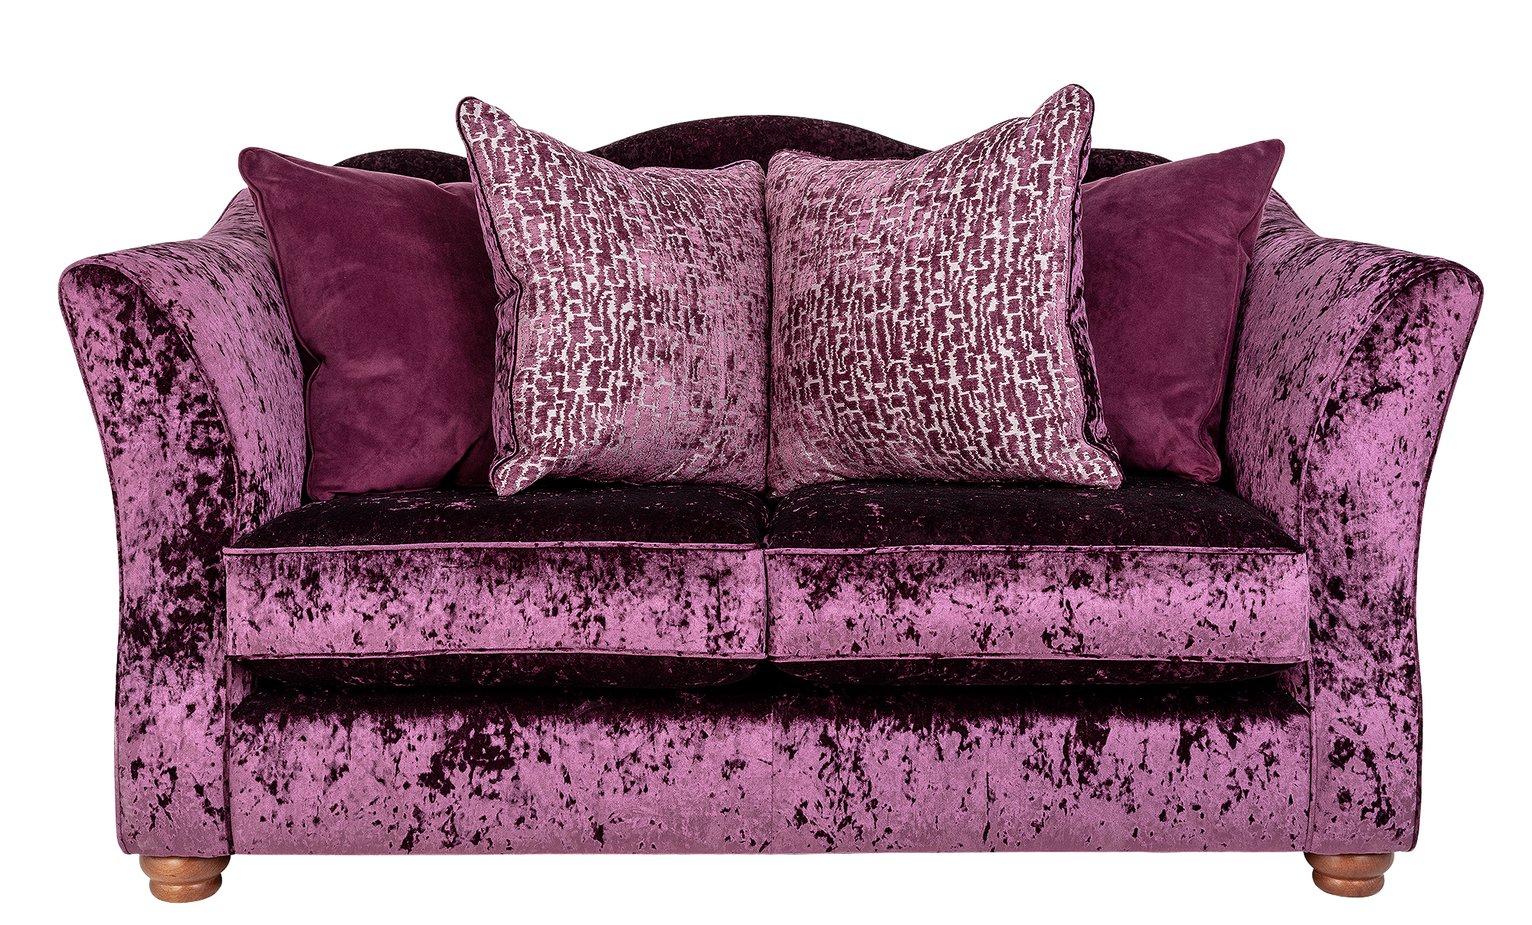 Argos Home Fantasia 2 Seater Velvet Sofa - Purple